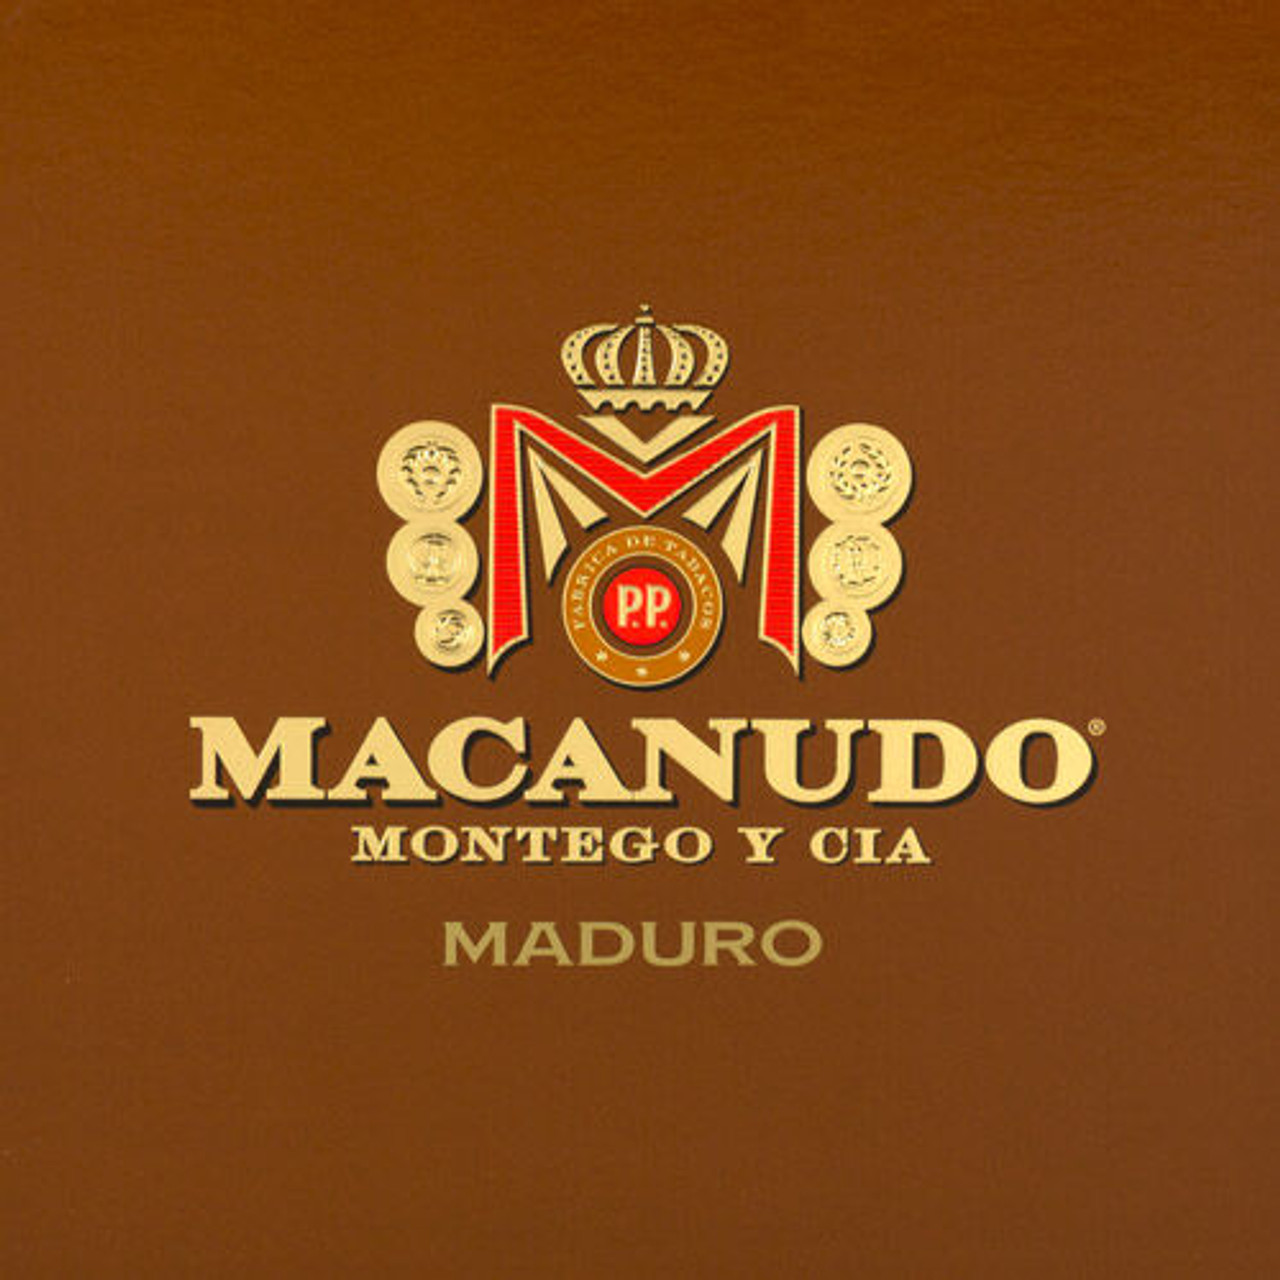 Macanudo Ascot Maduro Cigars Logo